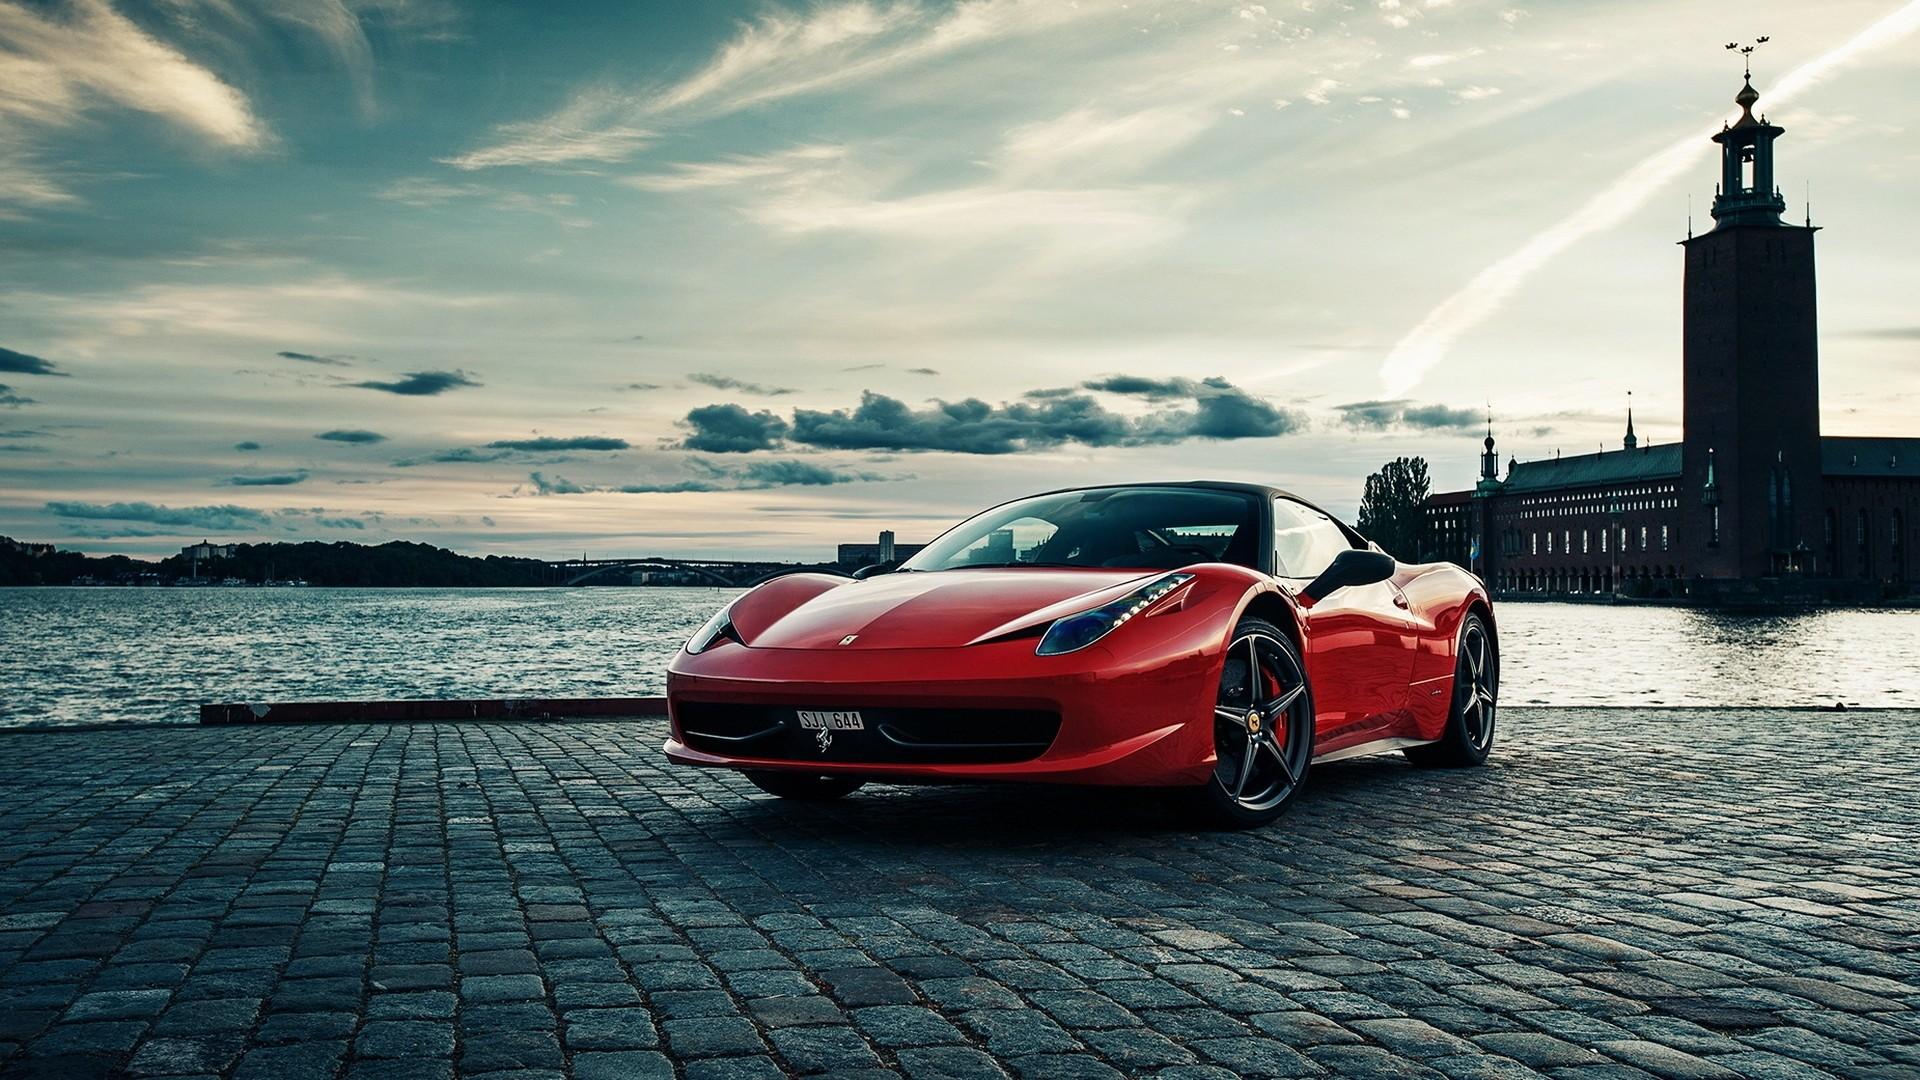 Ferrari 458 italia wallpaper image gallery hcpr ferrari 458 italia background hd wallpaper hd vanachro Image collections